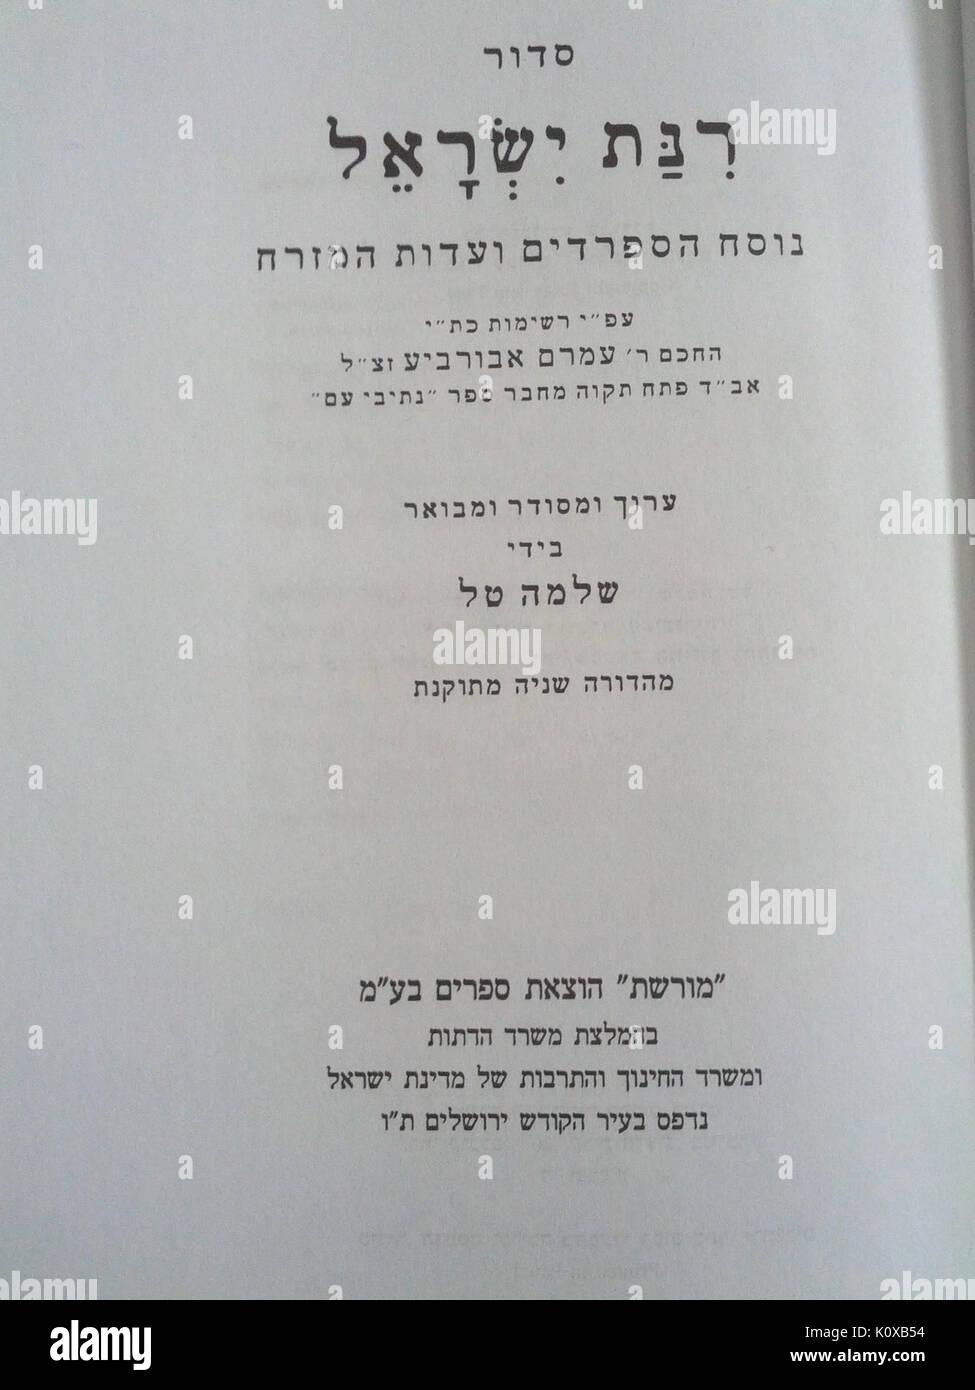 Amram Aburbeh Rinat Israel siddur Ha'Sfaradim ve'Edot HaMizrach - Stock Image